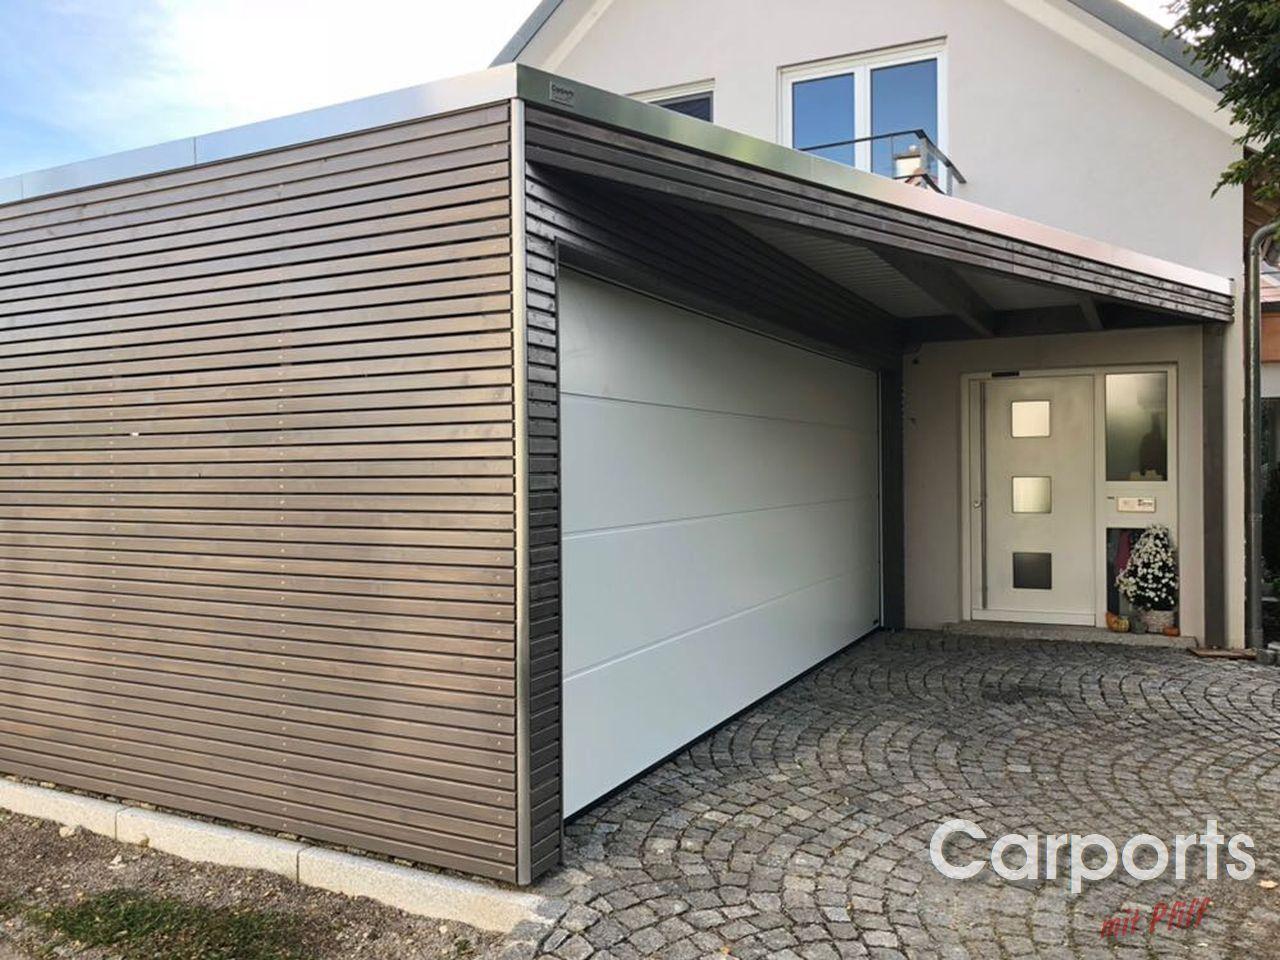 Carport Bauhaus Doppel Rhombo Mit Abstellraum Hausturuberdachung Dreieck Und Einen Sektionaltor Hausturuberdachung Uberdachungen Carport